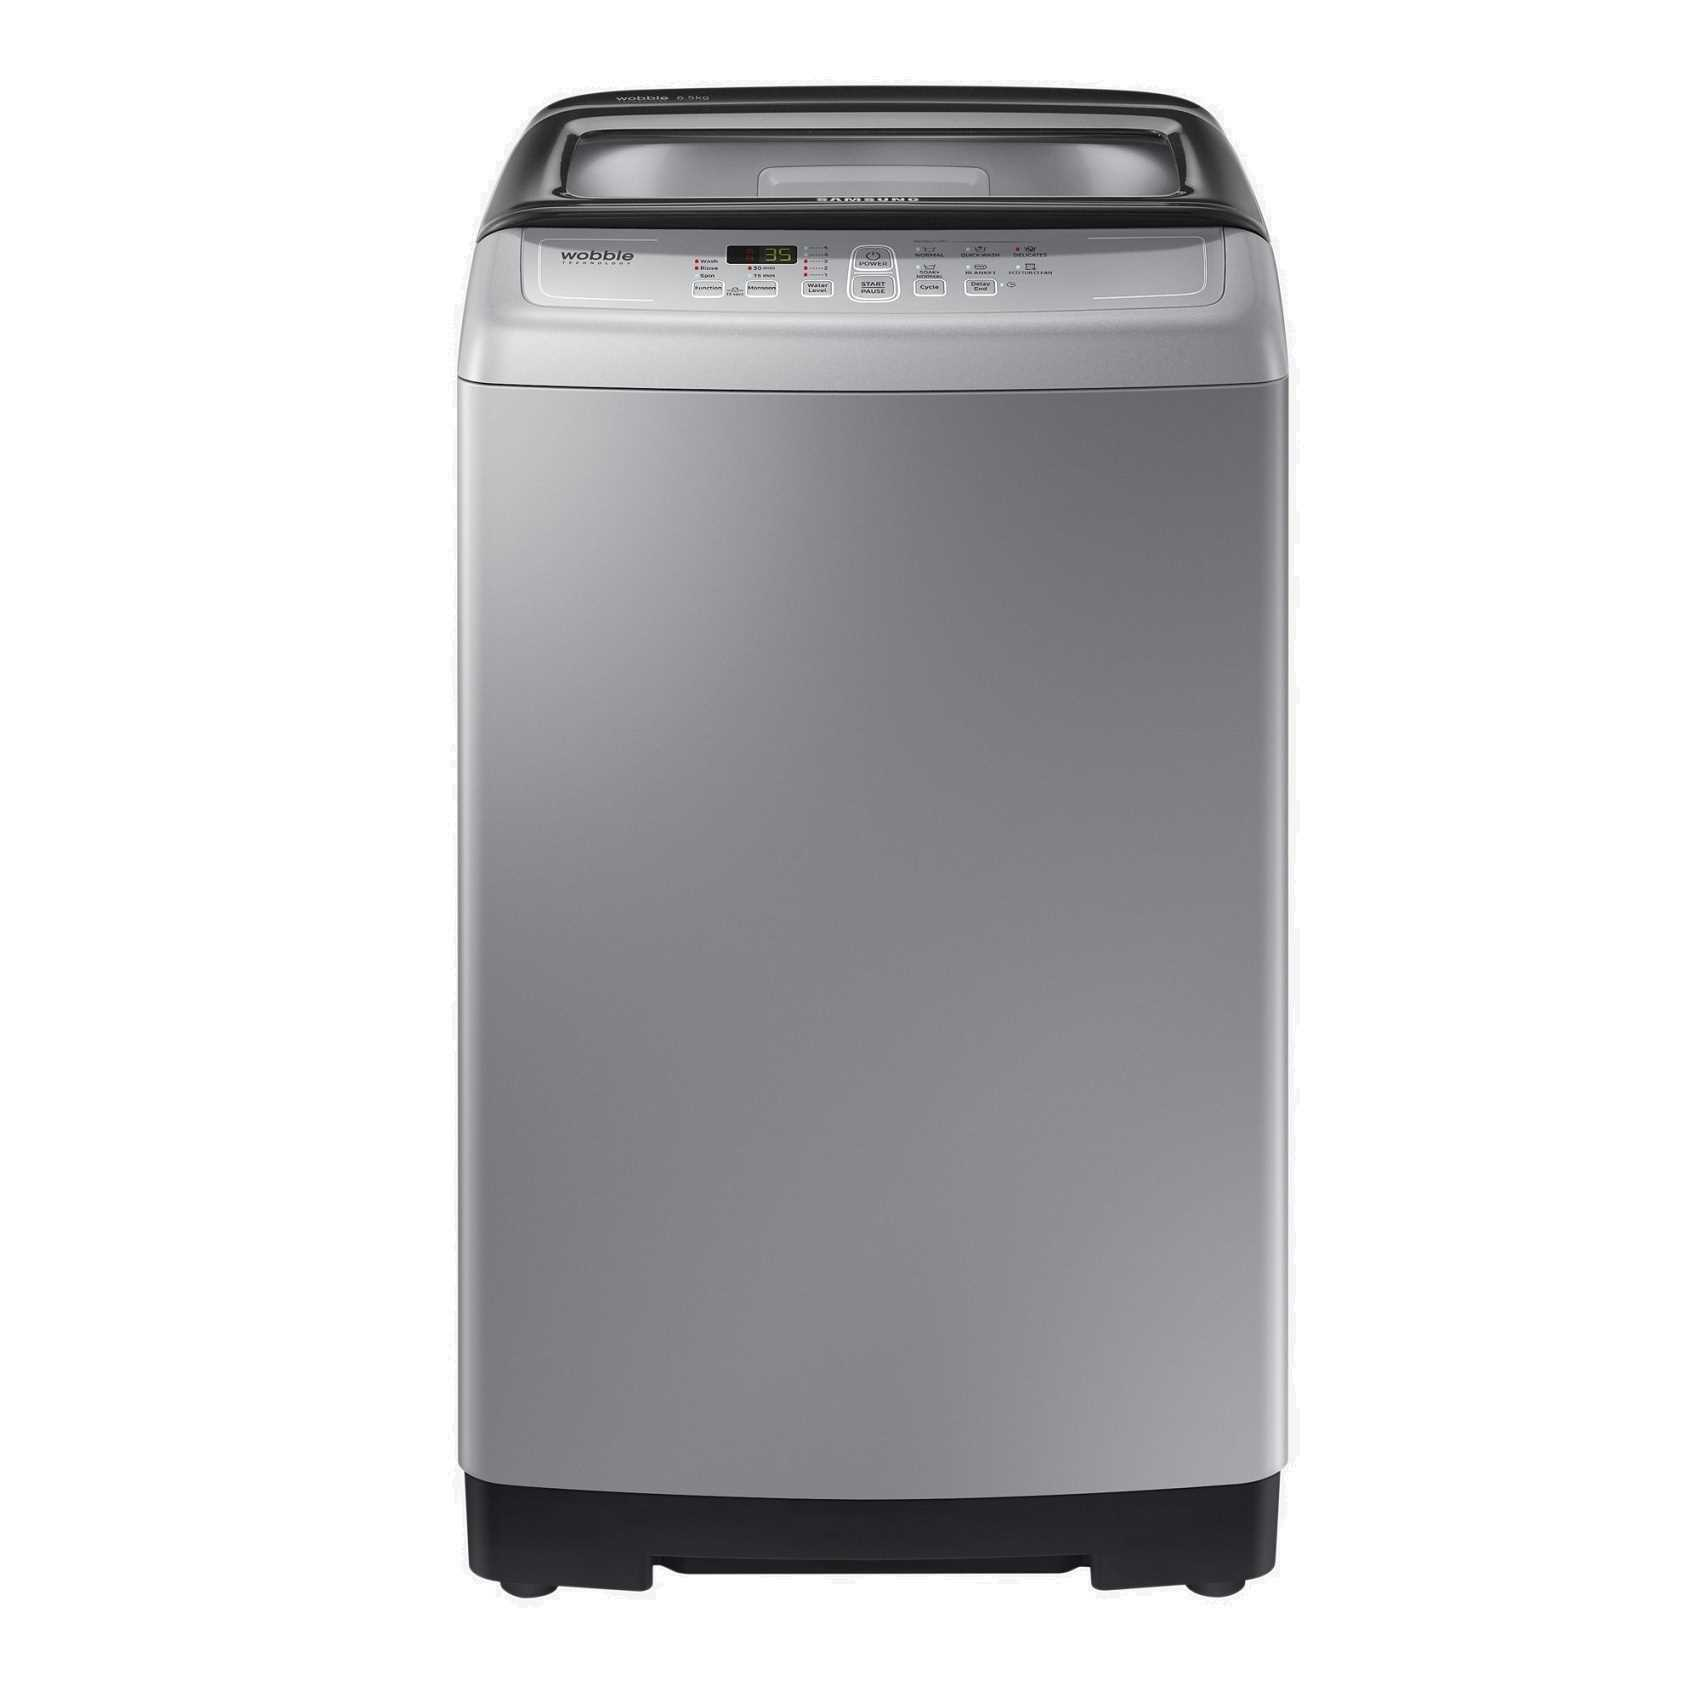 Samsung WA65M4300HA 6.5 Kg Fully Automatic Top Loading Washing Machine